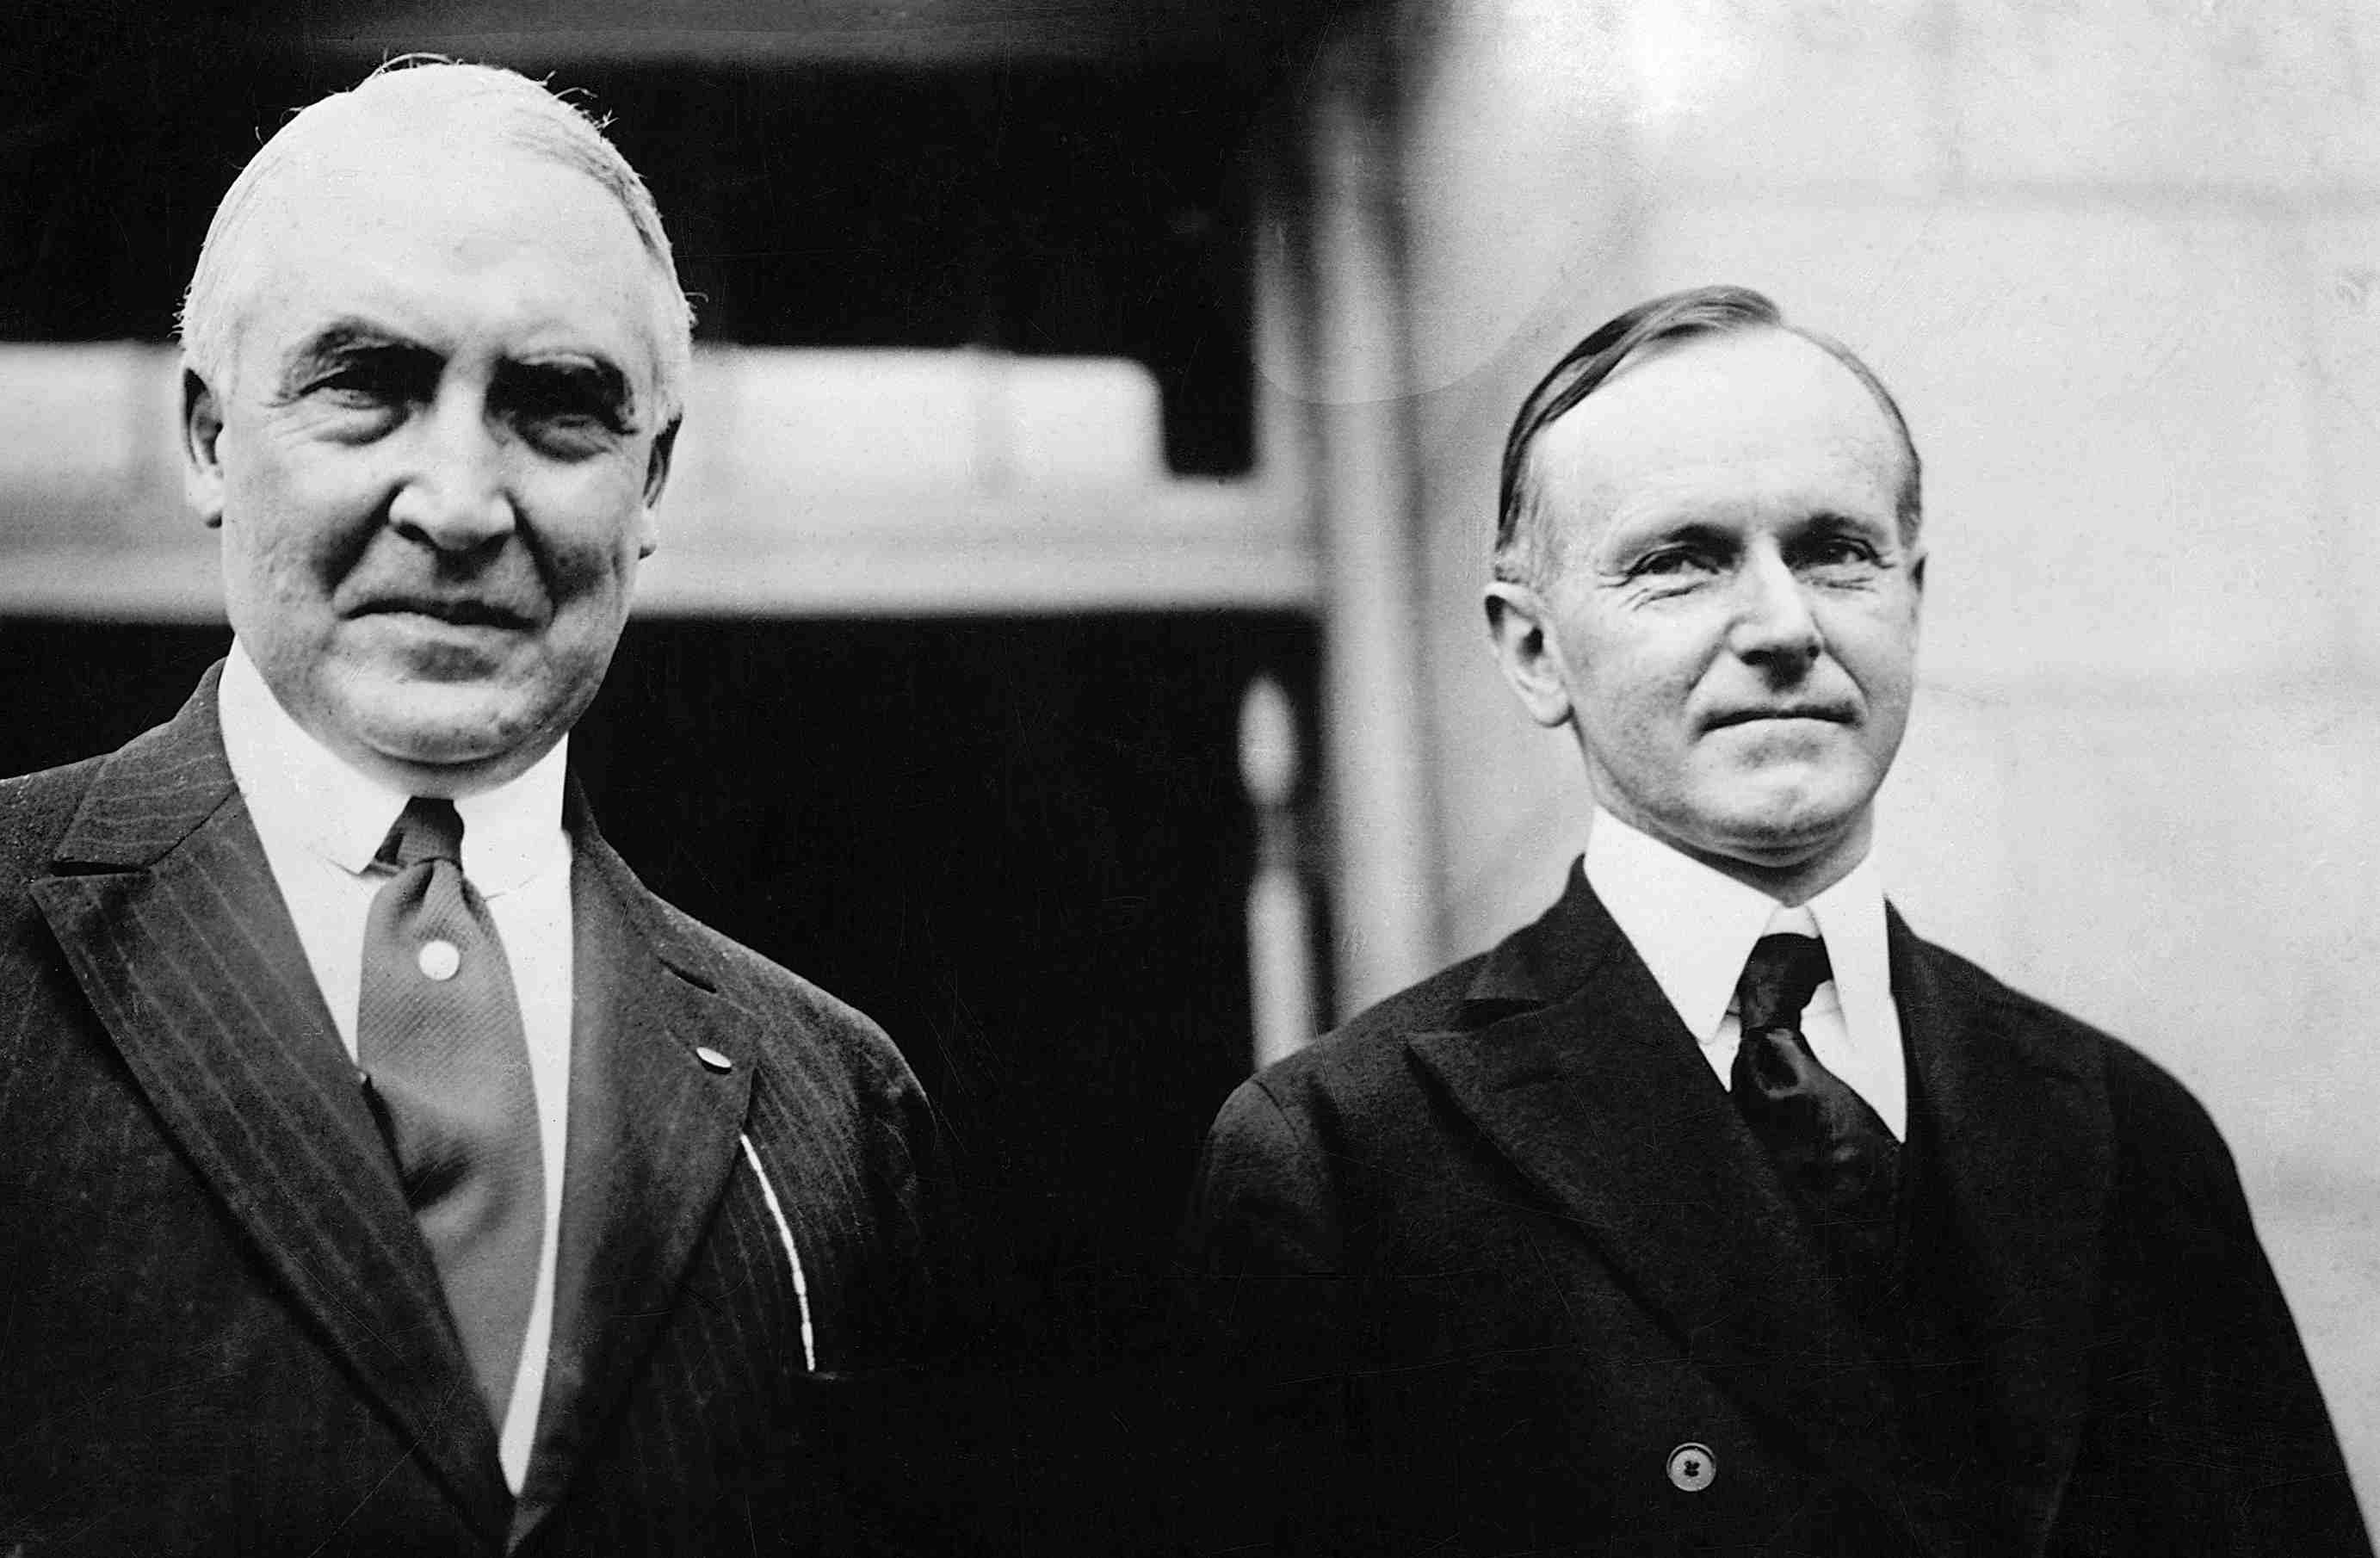 photograph of Warren Harding and Calvin Coolidge